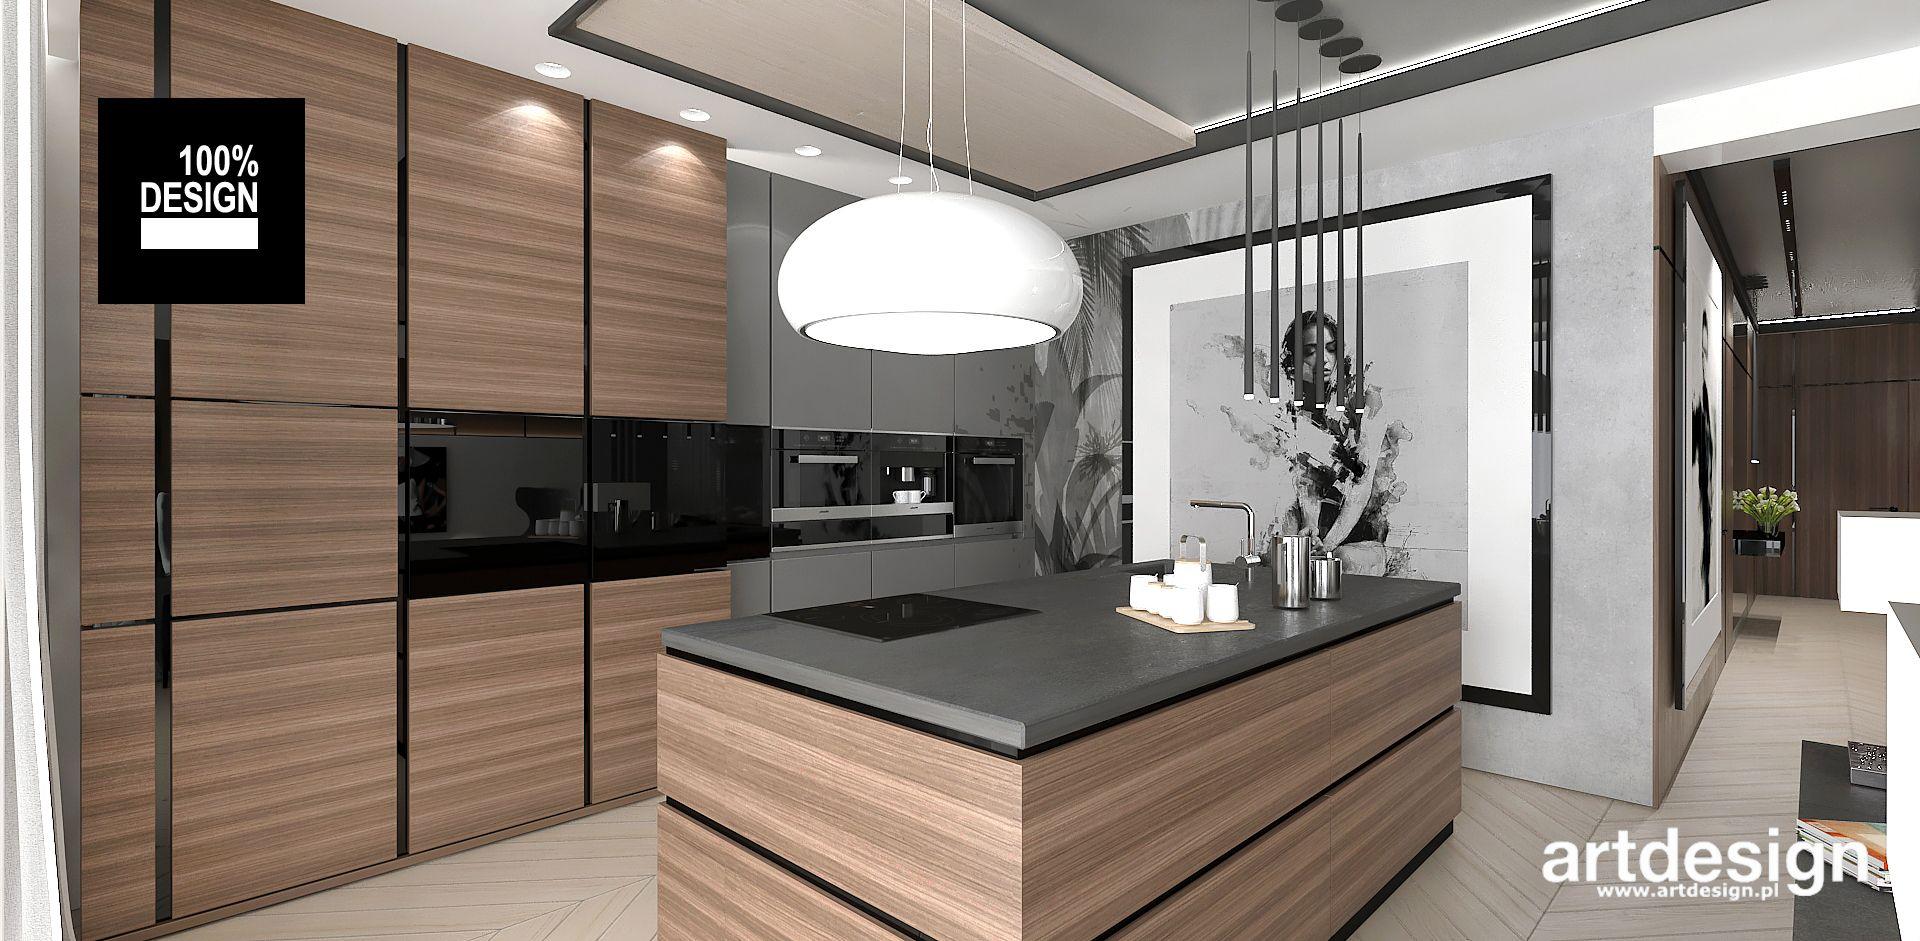 Foorni Pl Projekt Artdesign Projekt Kuchni Z Wyspa Wyspa Kuchnia Projekt Jadalnia Modern Interior Kitchen Home Decor Home Room Divider